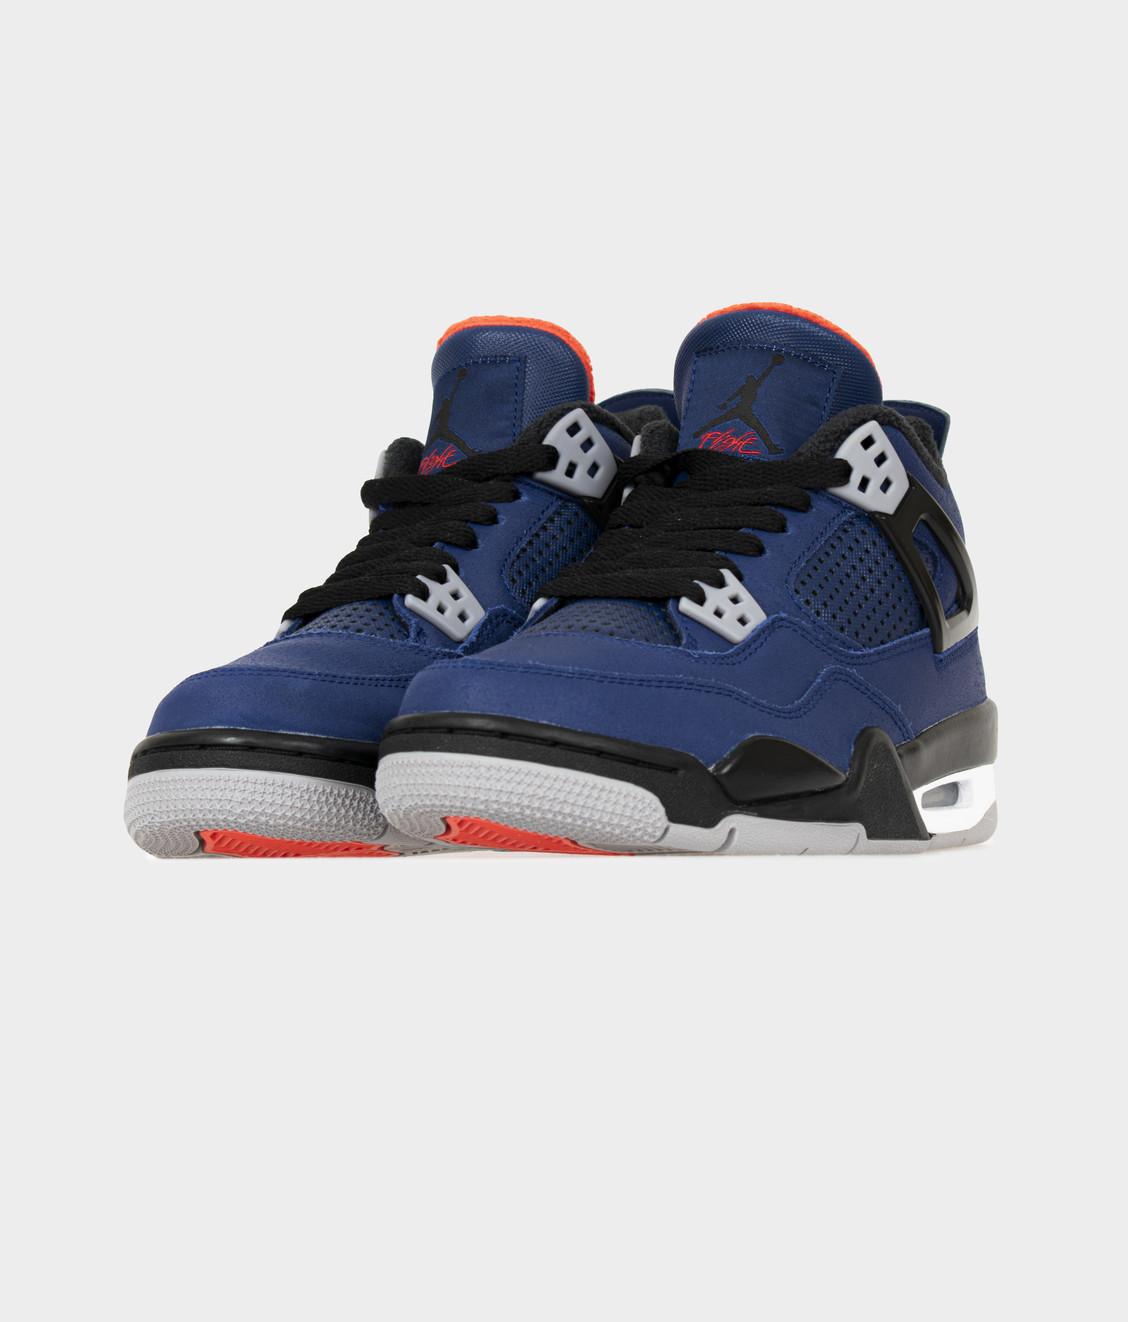 Nike Nike Air Jordan 4 Retro WNTR Loyal Blue